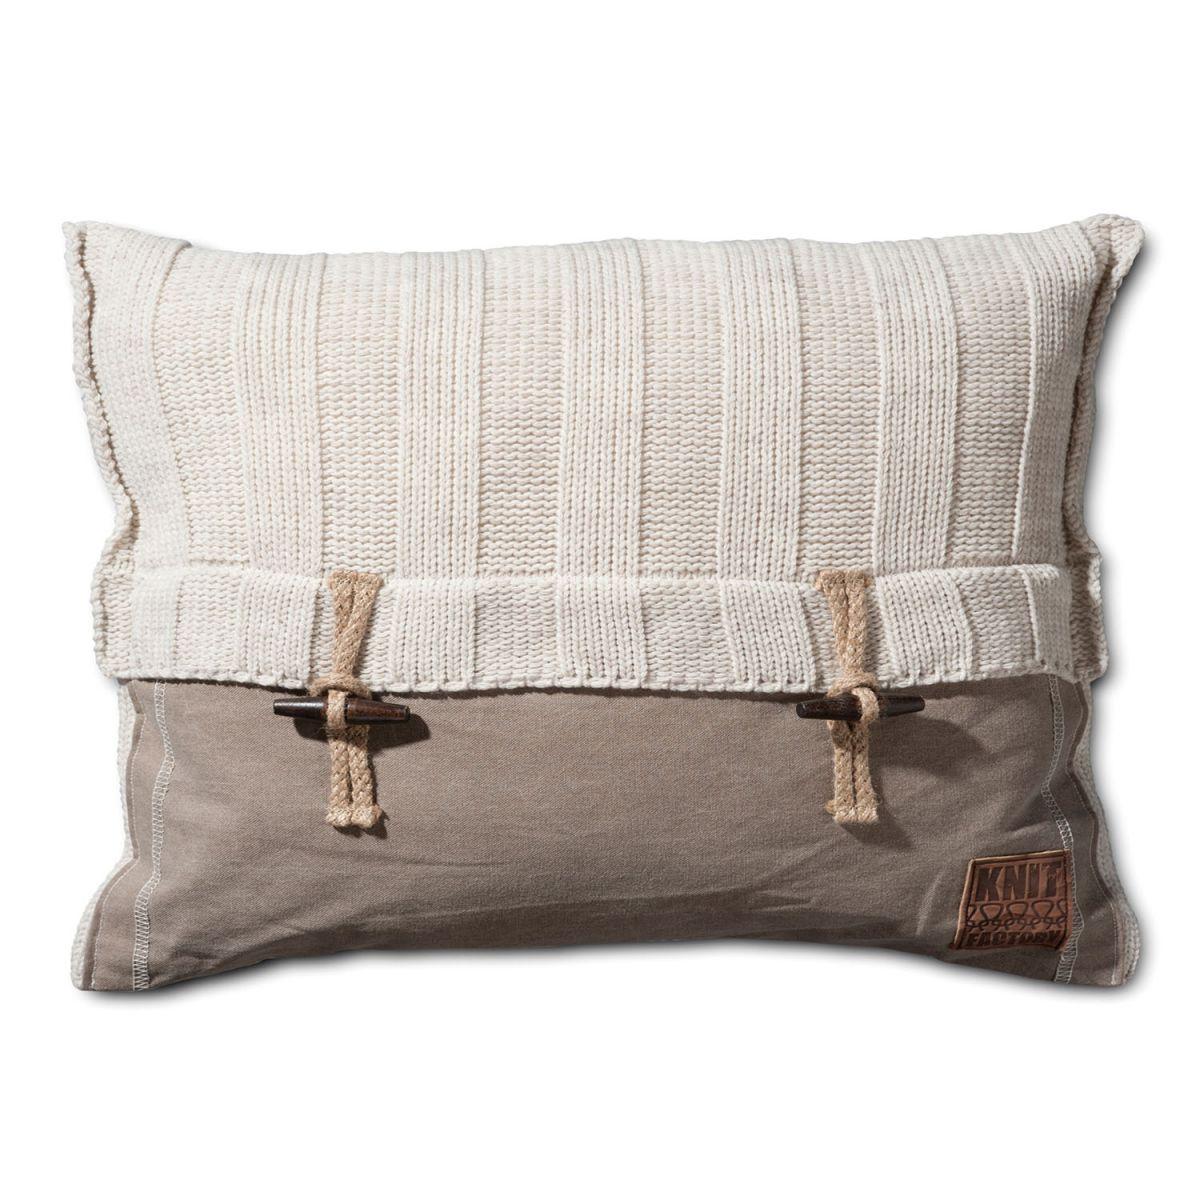 6x6 rib cushion beige 60x40